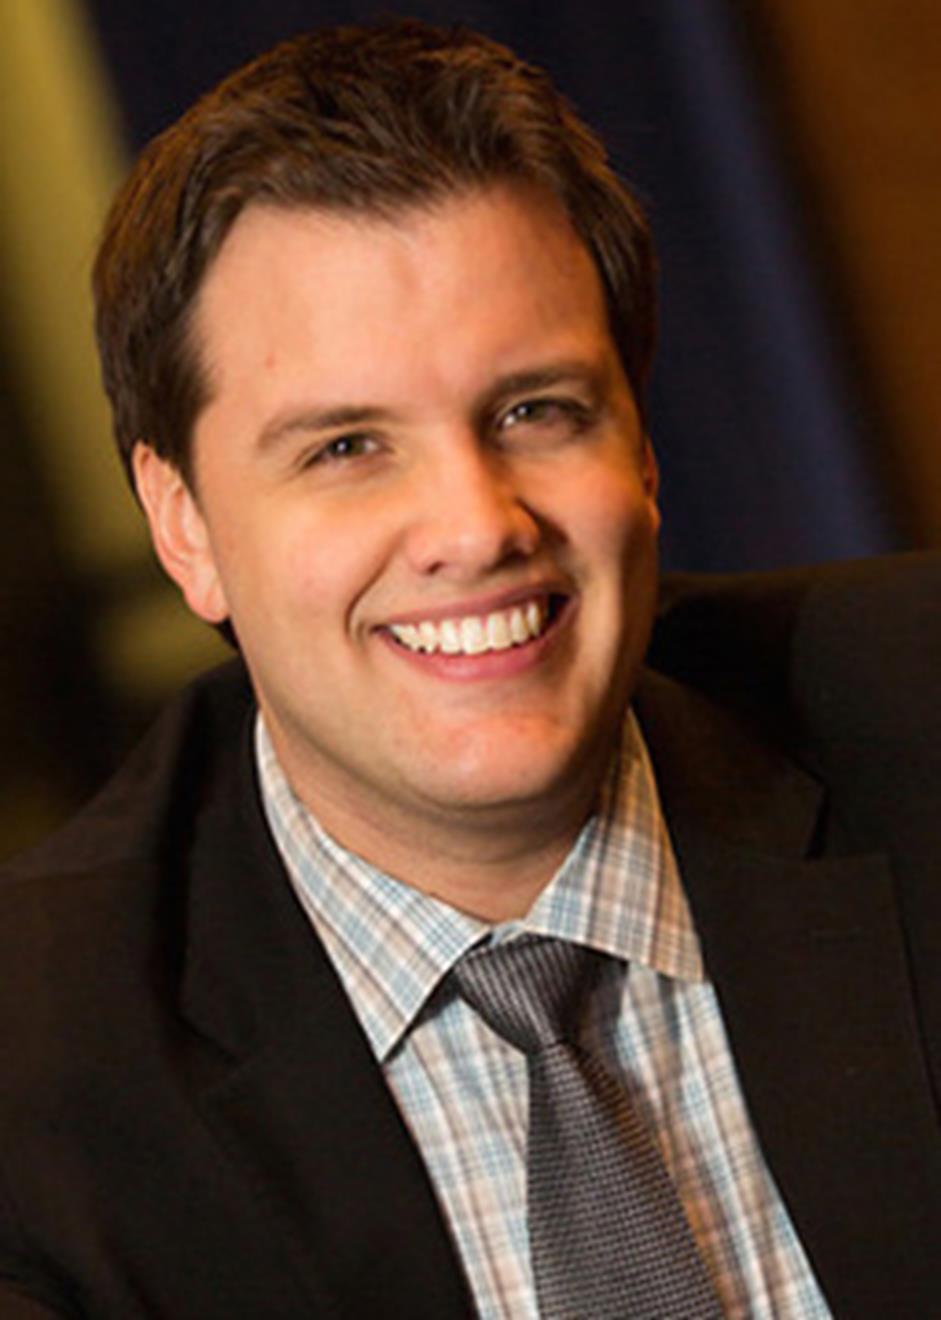 Daniel Mattix